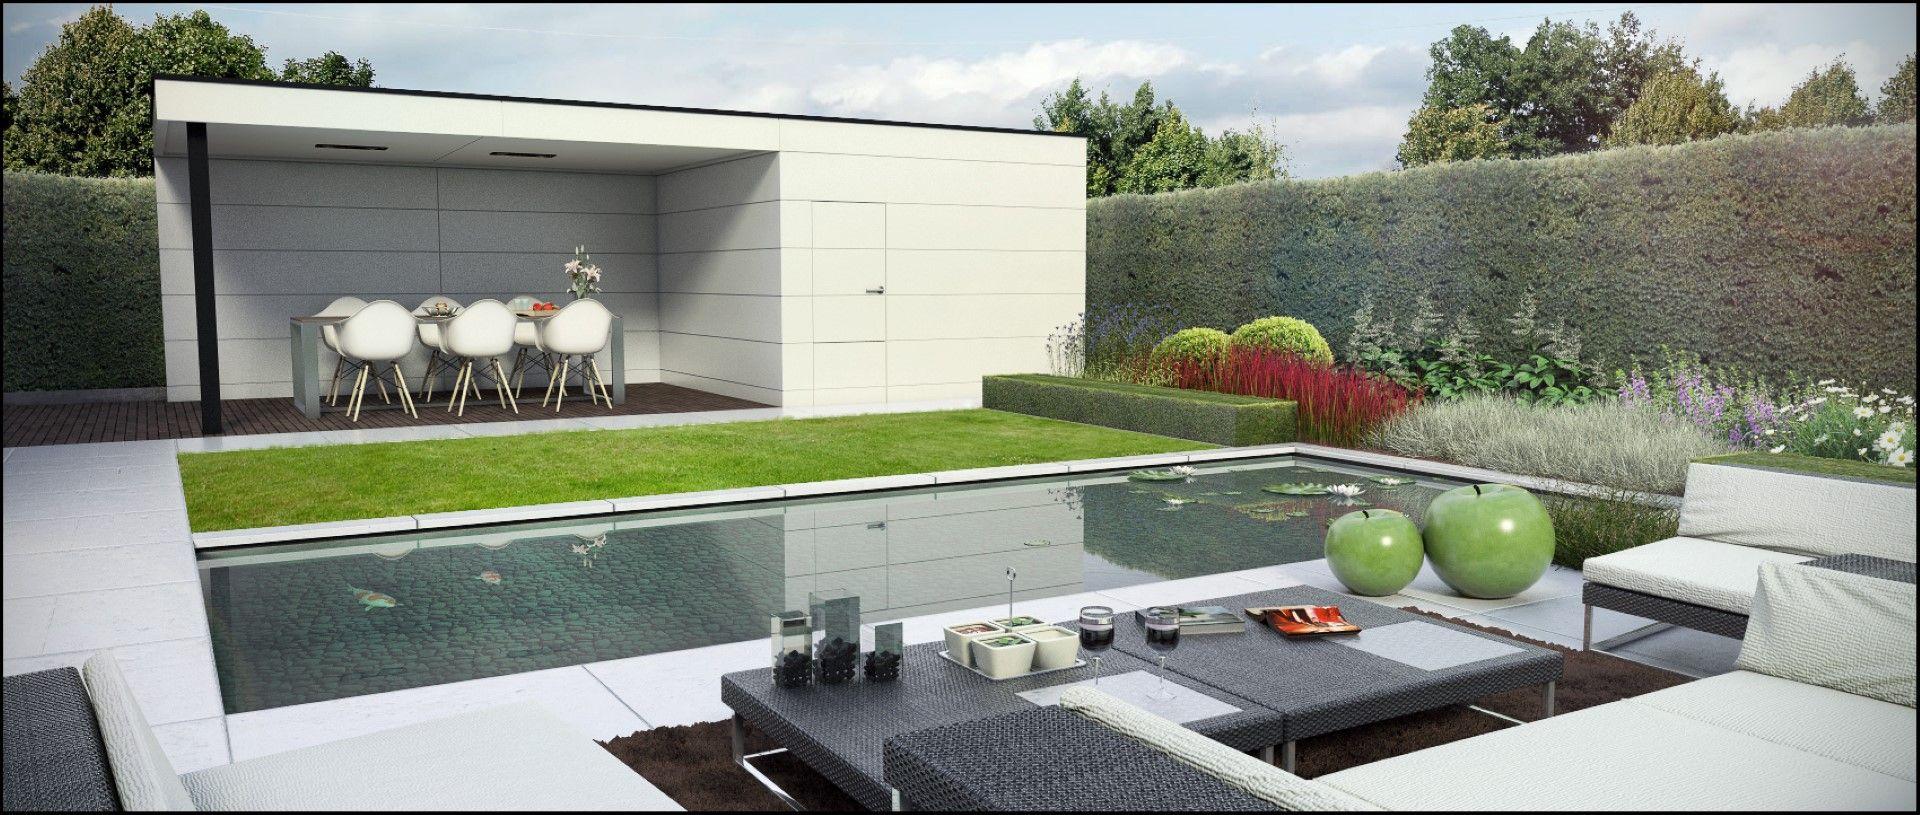 Eco tuinarchitectengroep 3d projecten moderne tuin for Tuinarchitect modern strak